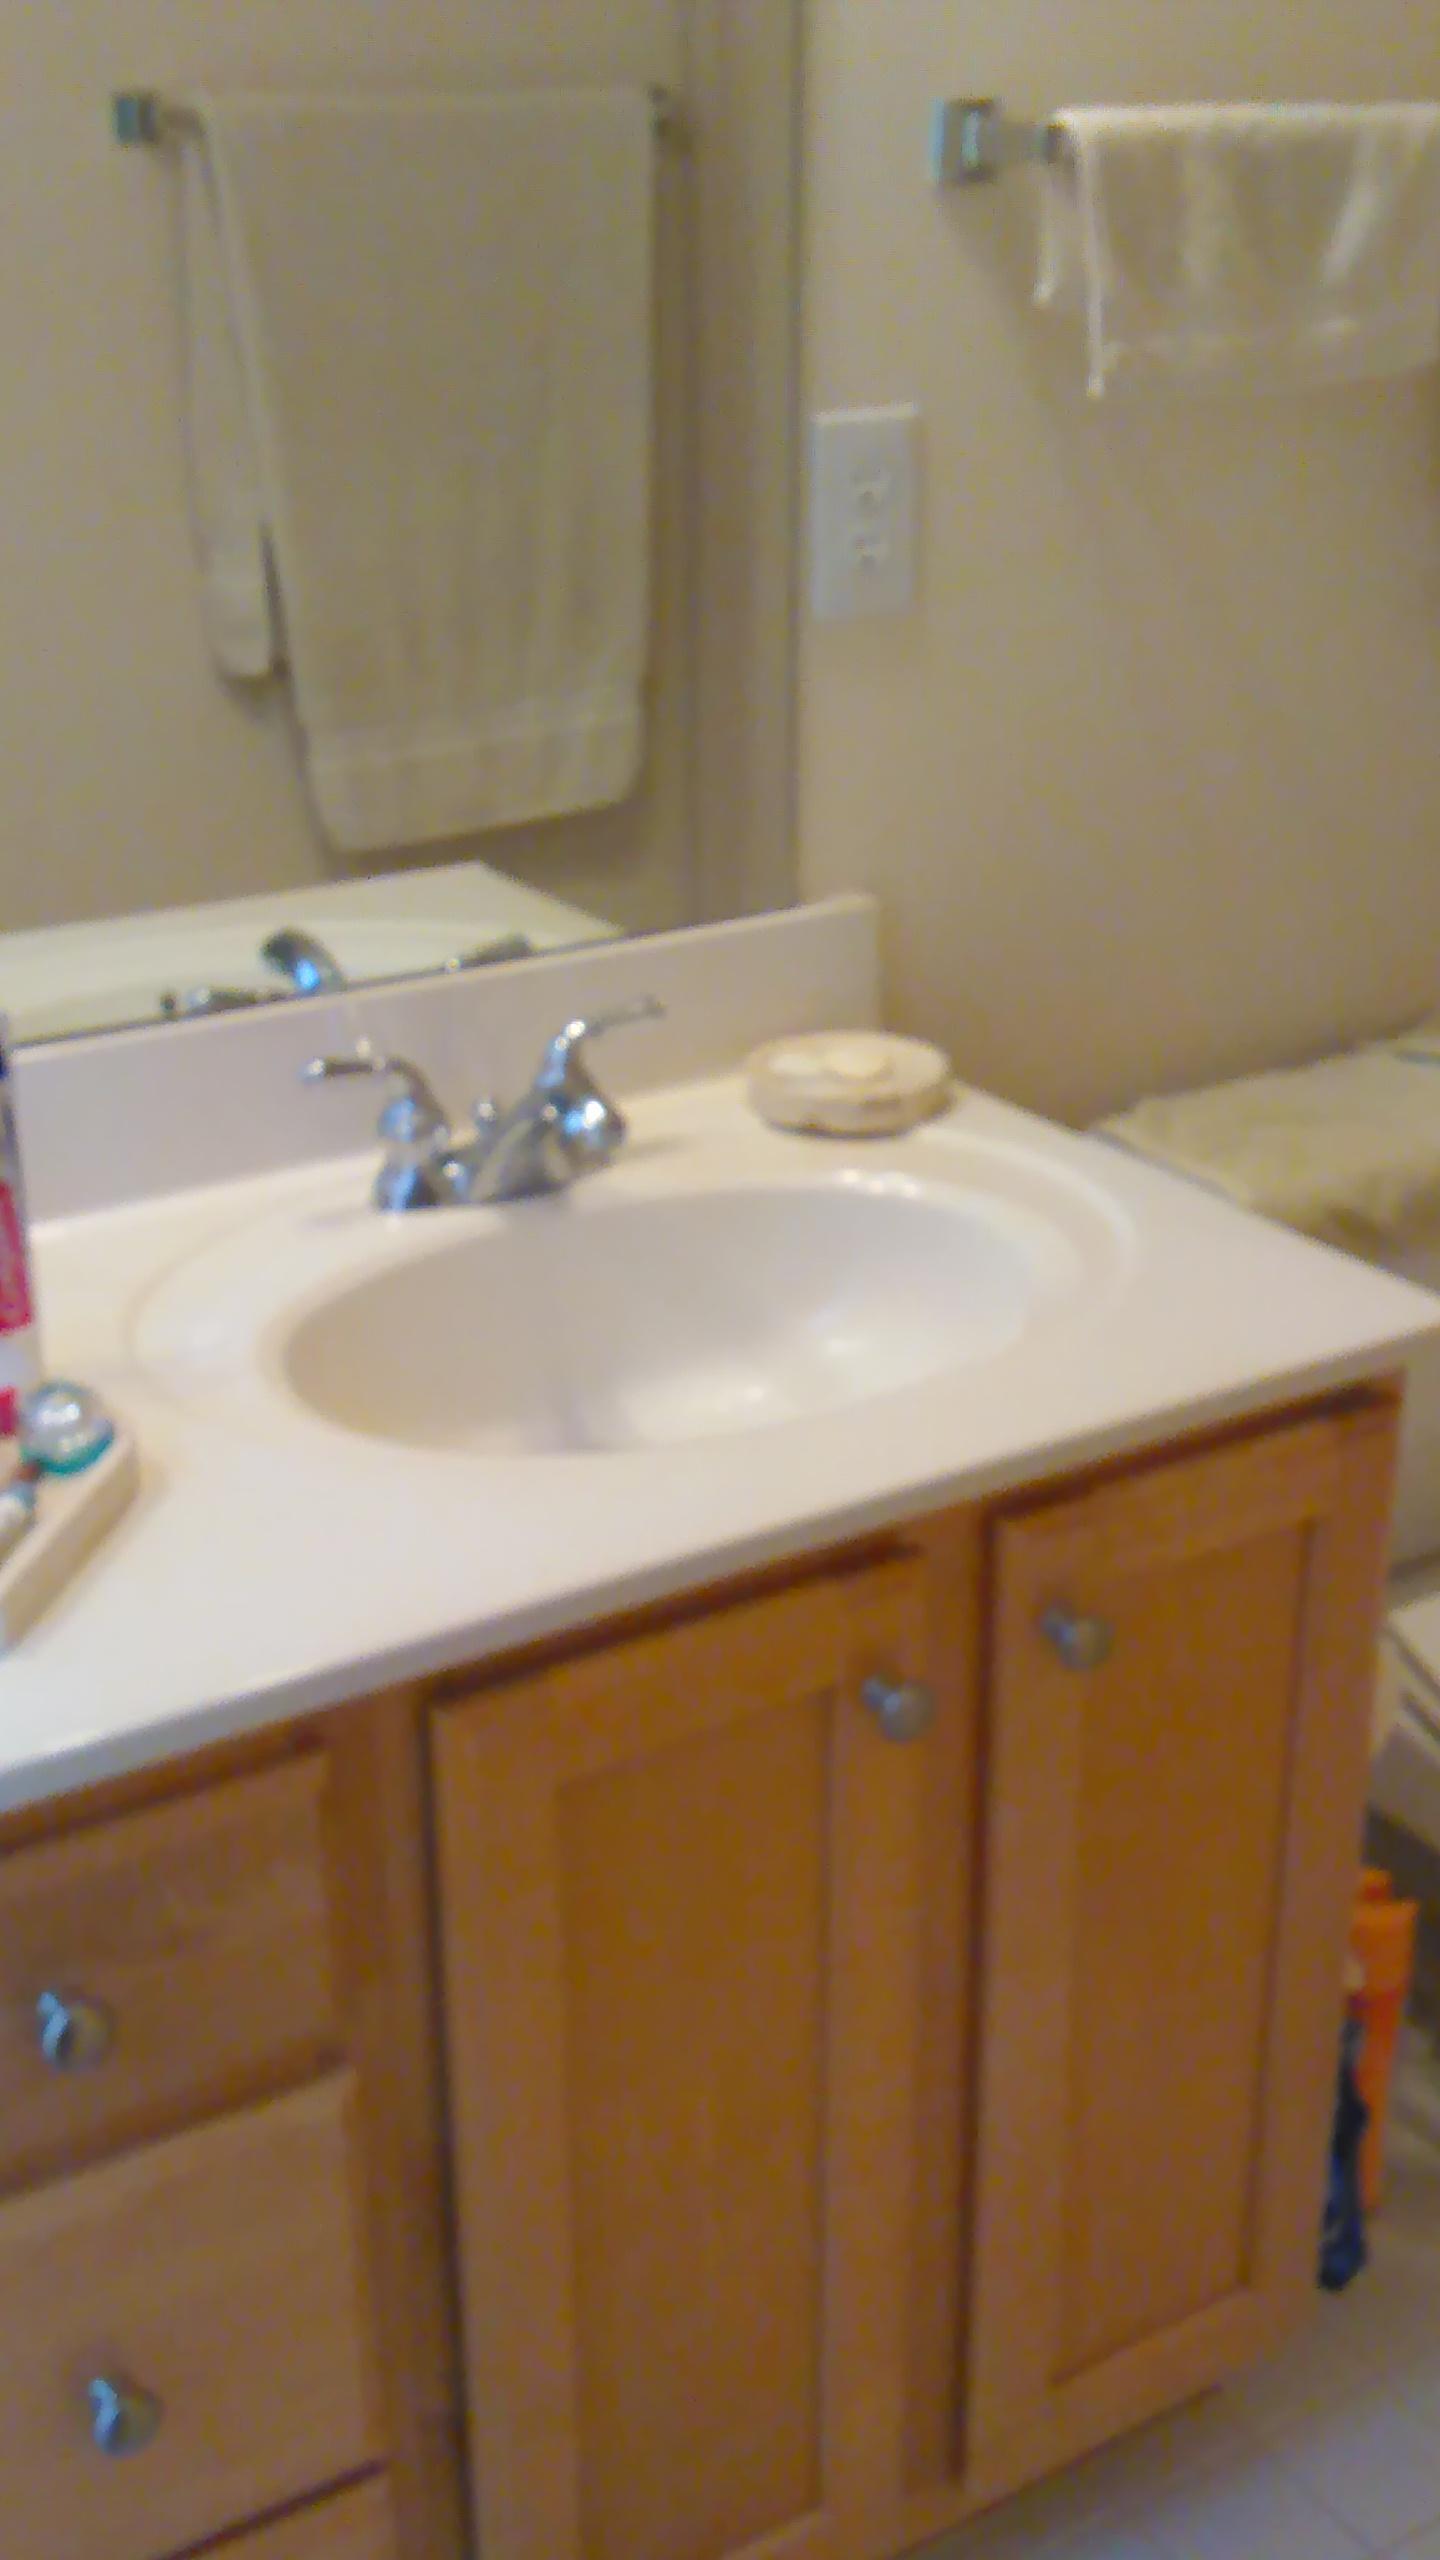 Copperline Drive, 527 - Bathroom.jpg